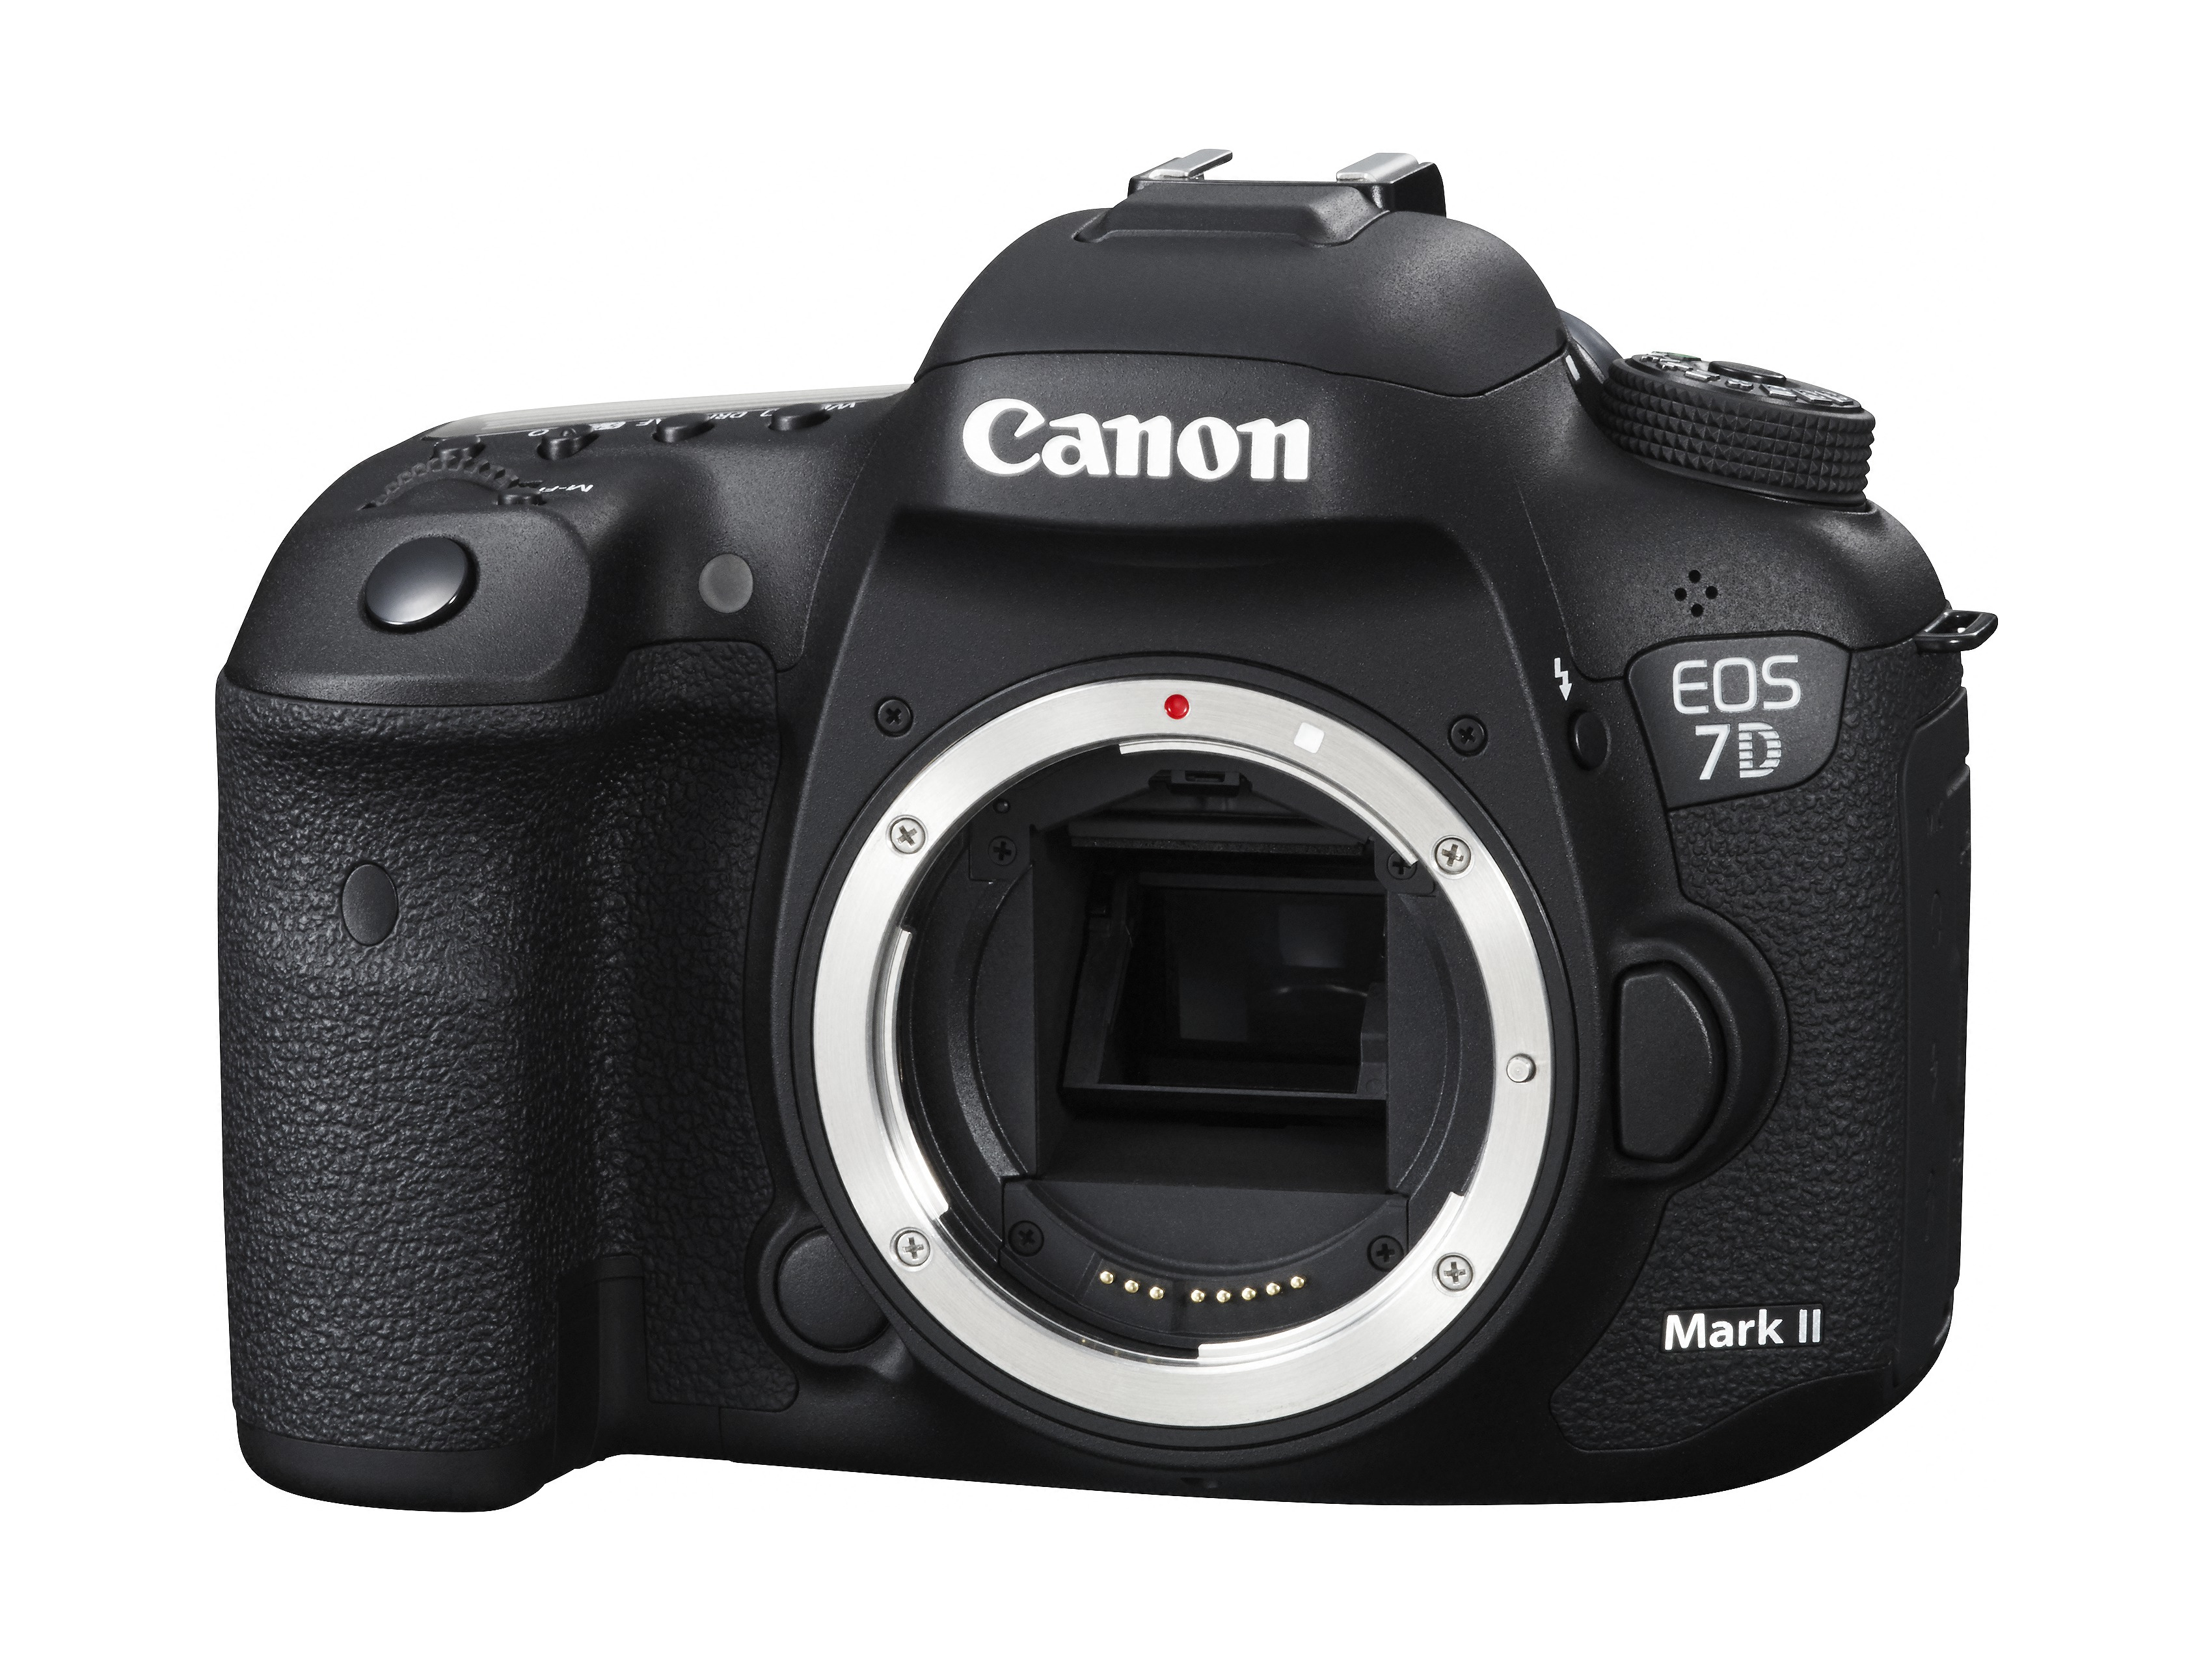 Canon EOS 7D Mark II DSLR Camera + W-E1 Wi-Fi Adapter + 16GB CF Card + Case